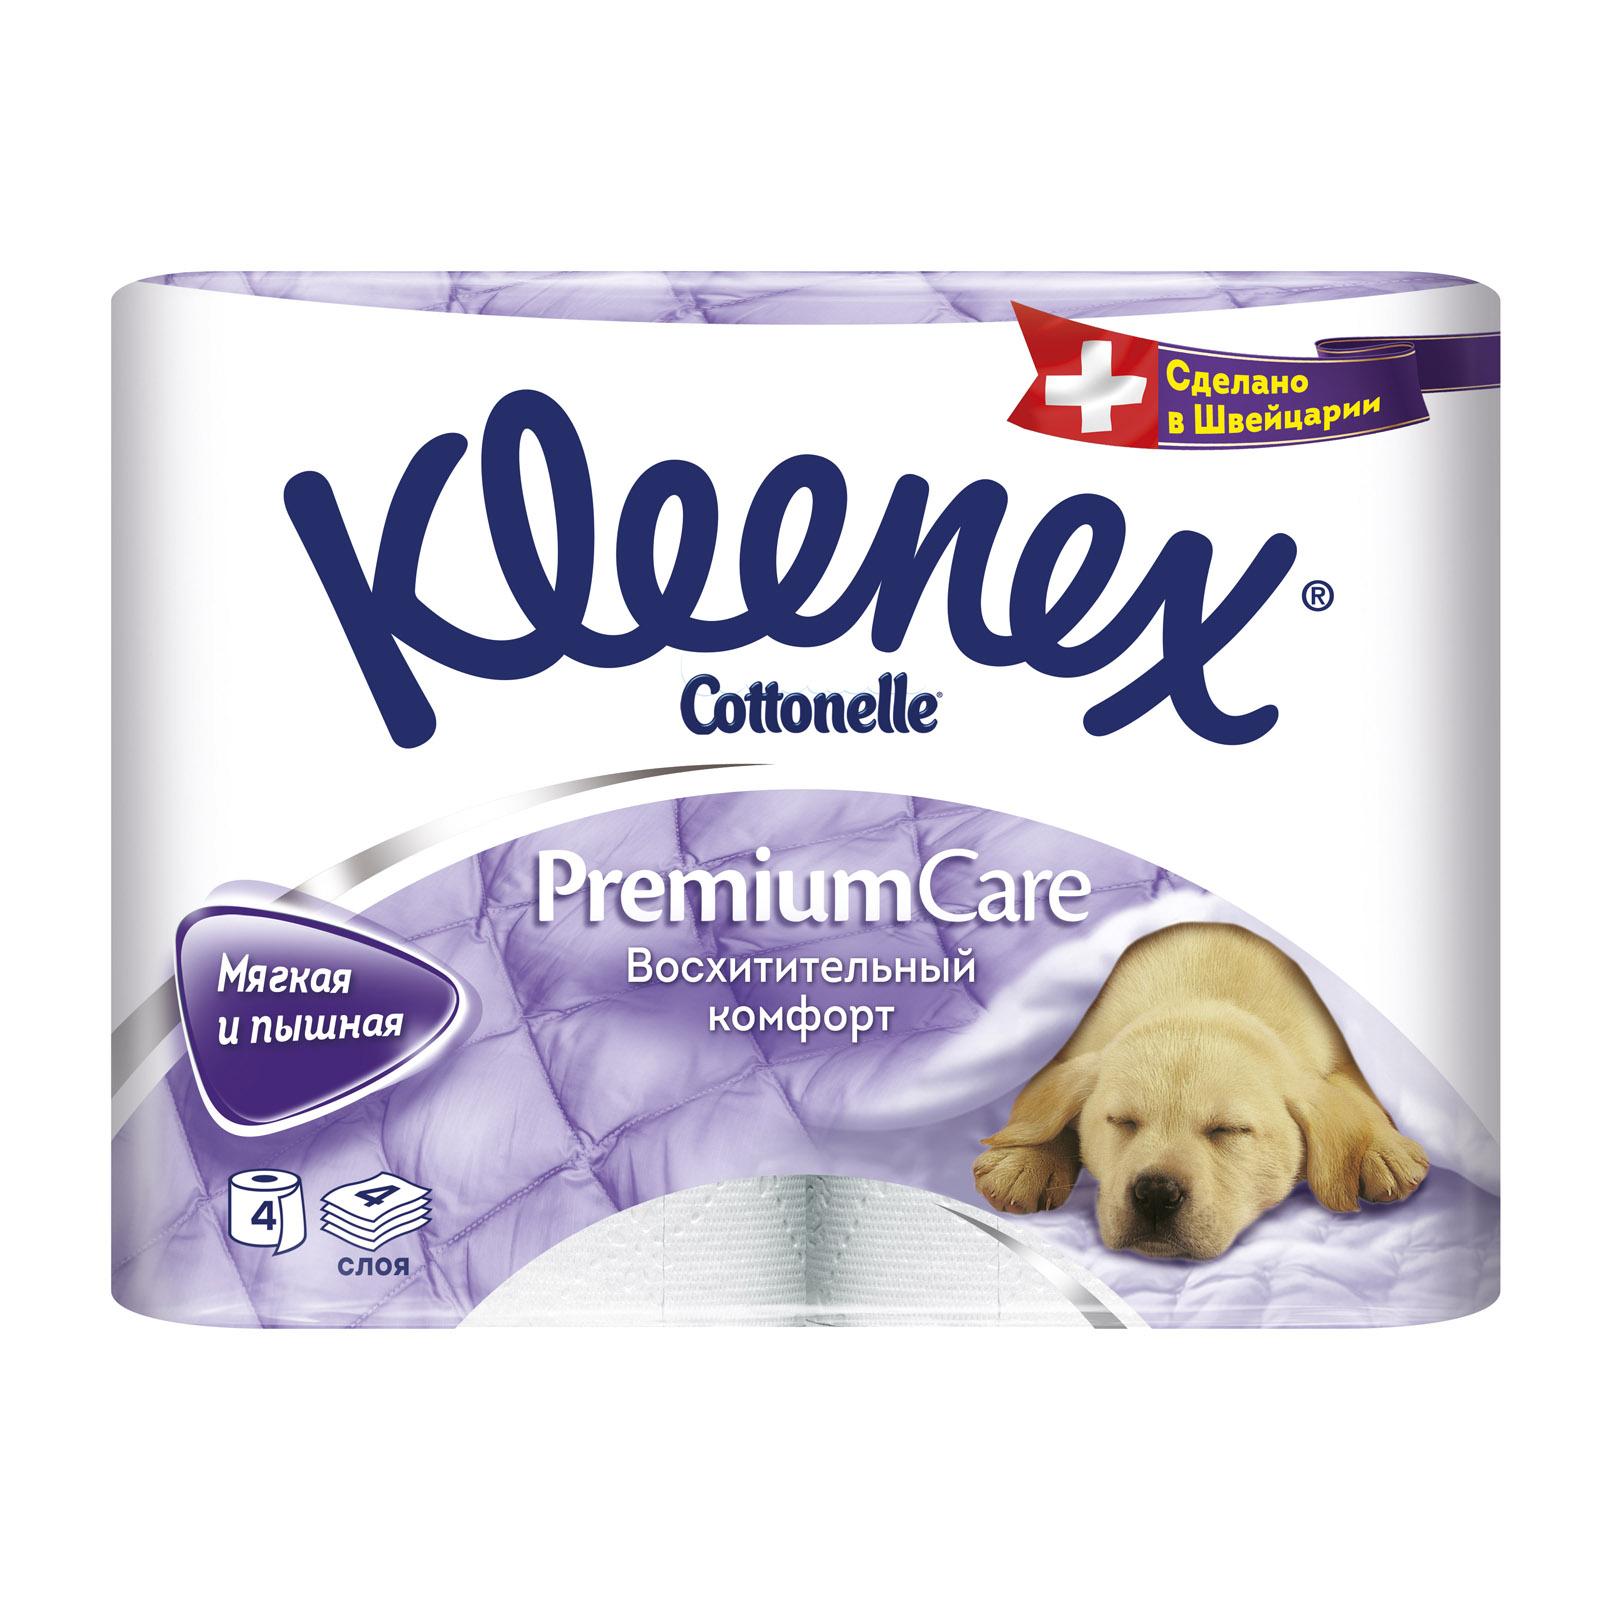 Туалетная бумага Kleenex премиум комфорт (4 слоя) 4 шт<br>